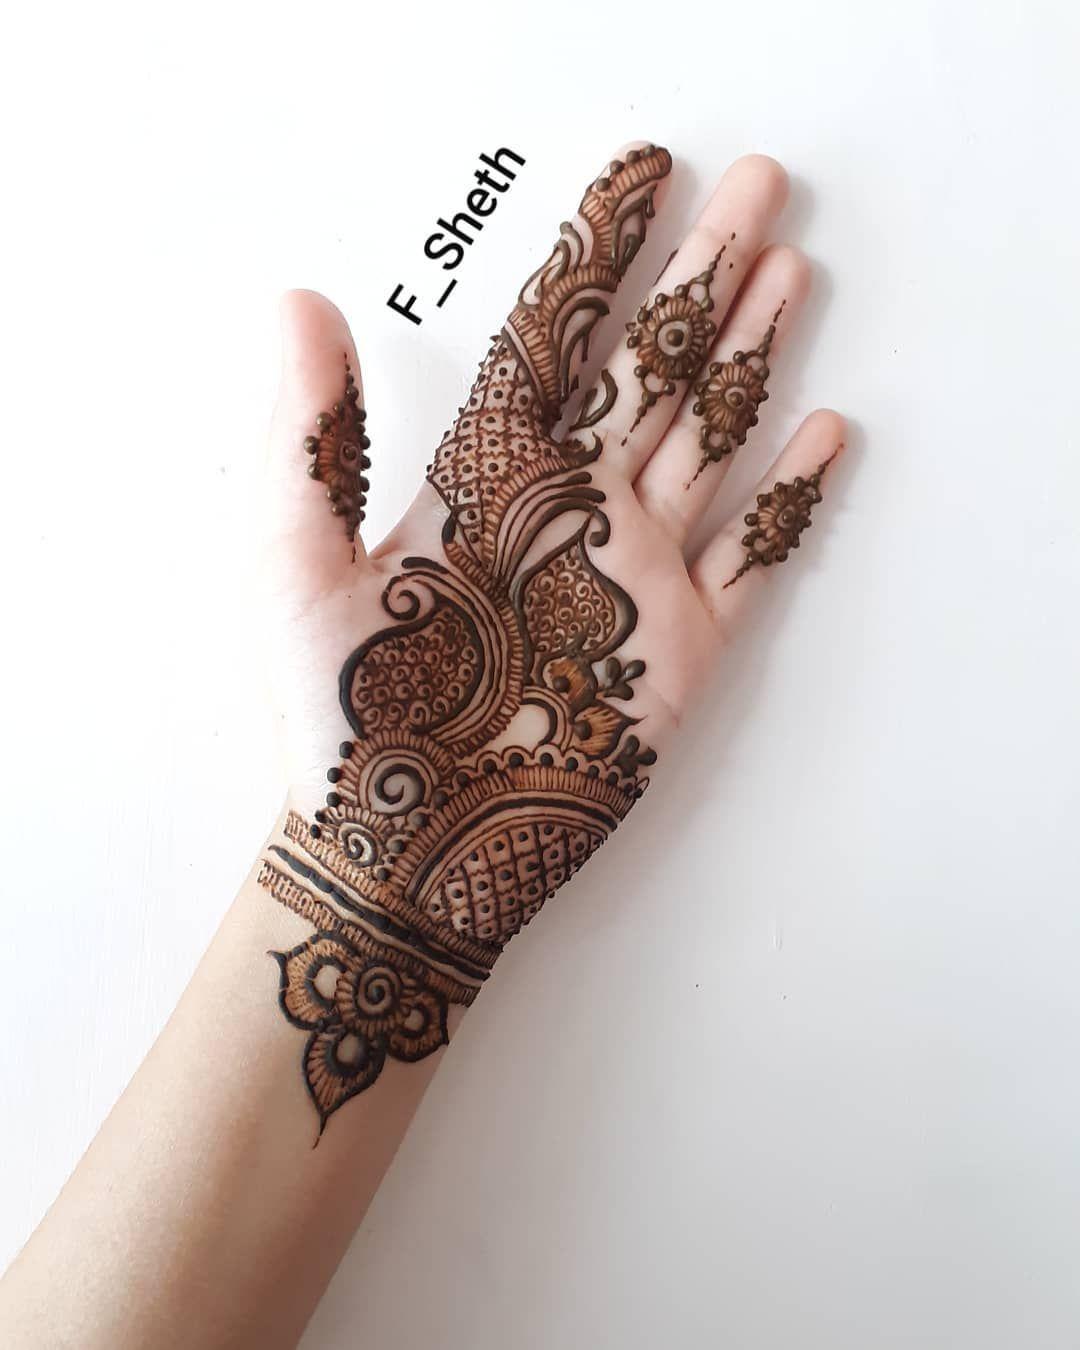 Latest Arabic Mehndi Design For Front Hand K4 Fashion In 2020 Latest Arabic Mehndi Designs Mehndi Designs Mehndi Art Designs